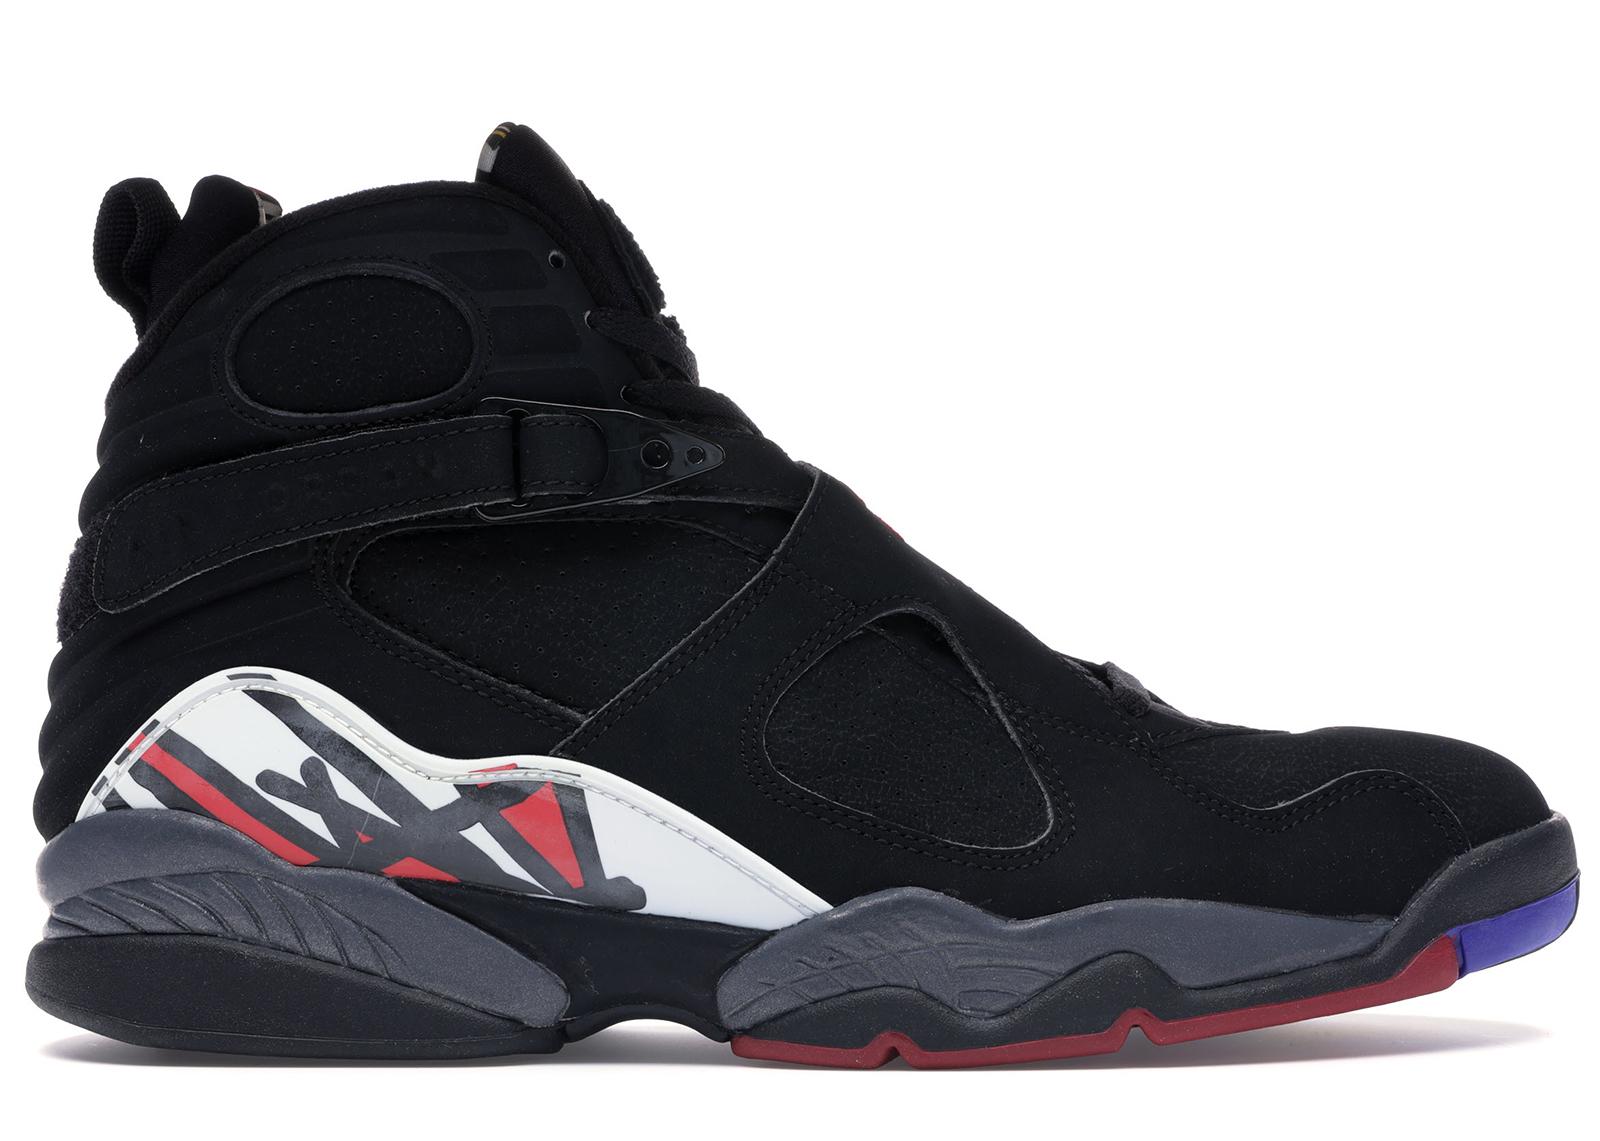 Jordan 8 Retro Playoffs (2007) - 305381-061